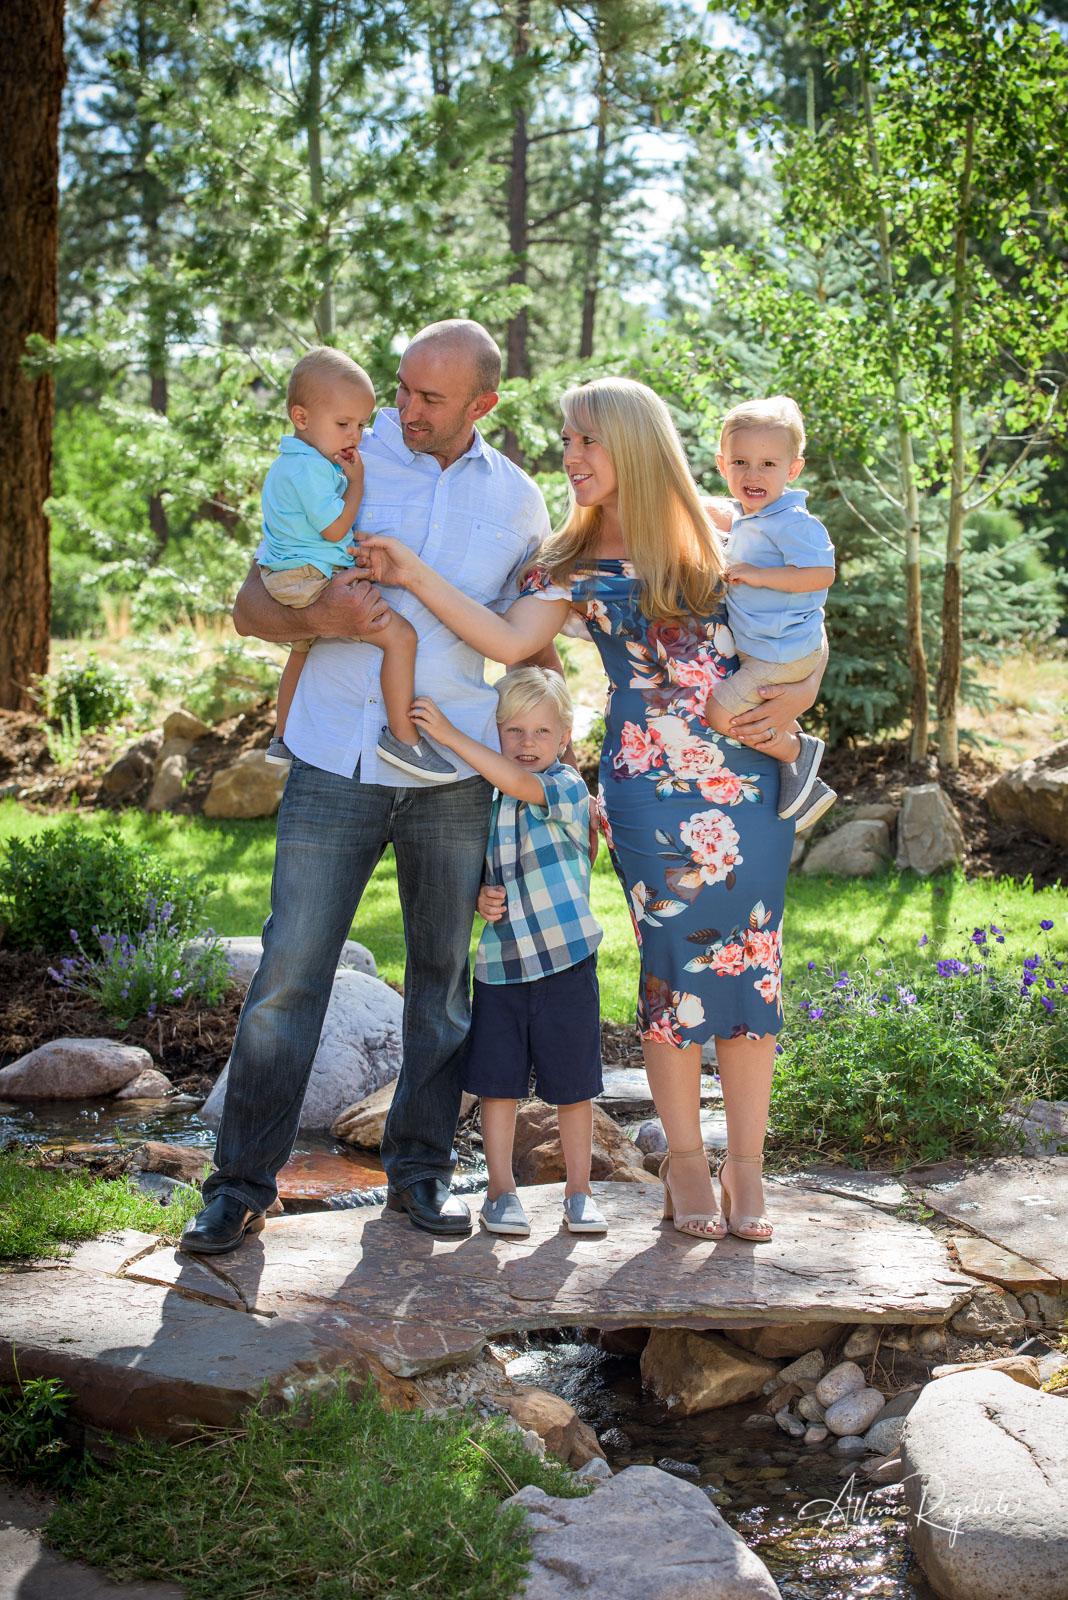 Durango Family portraits by Allison Ragsdale Photography in Durango Colorado